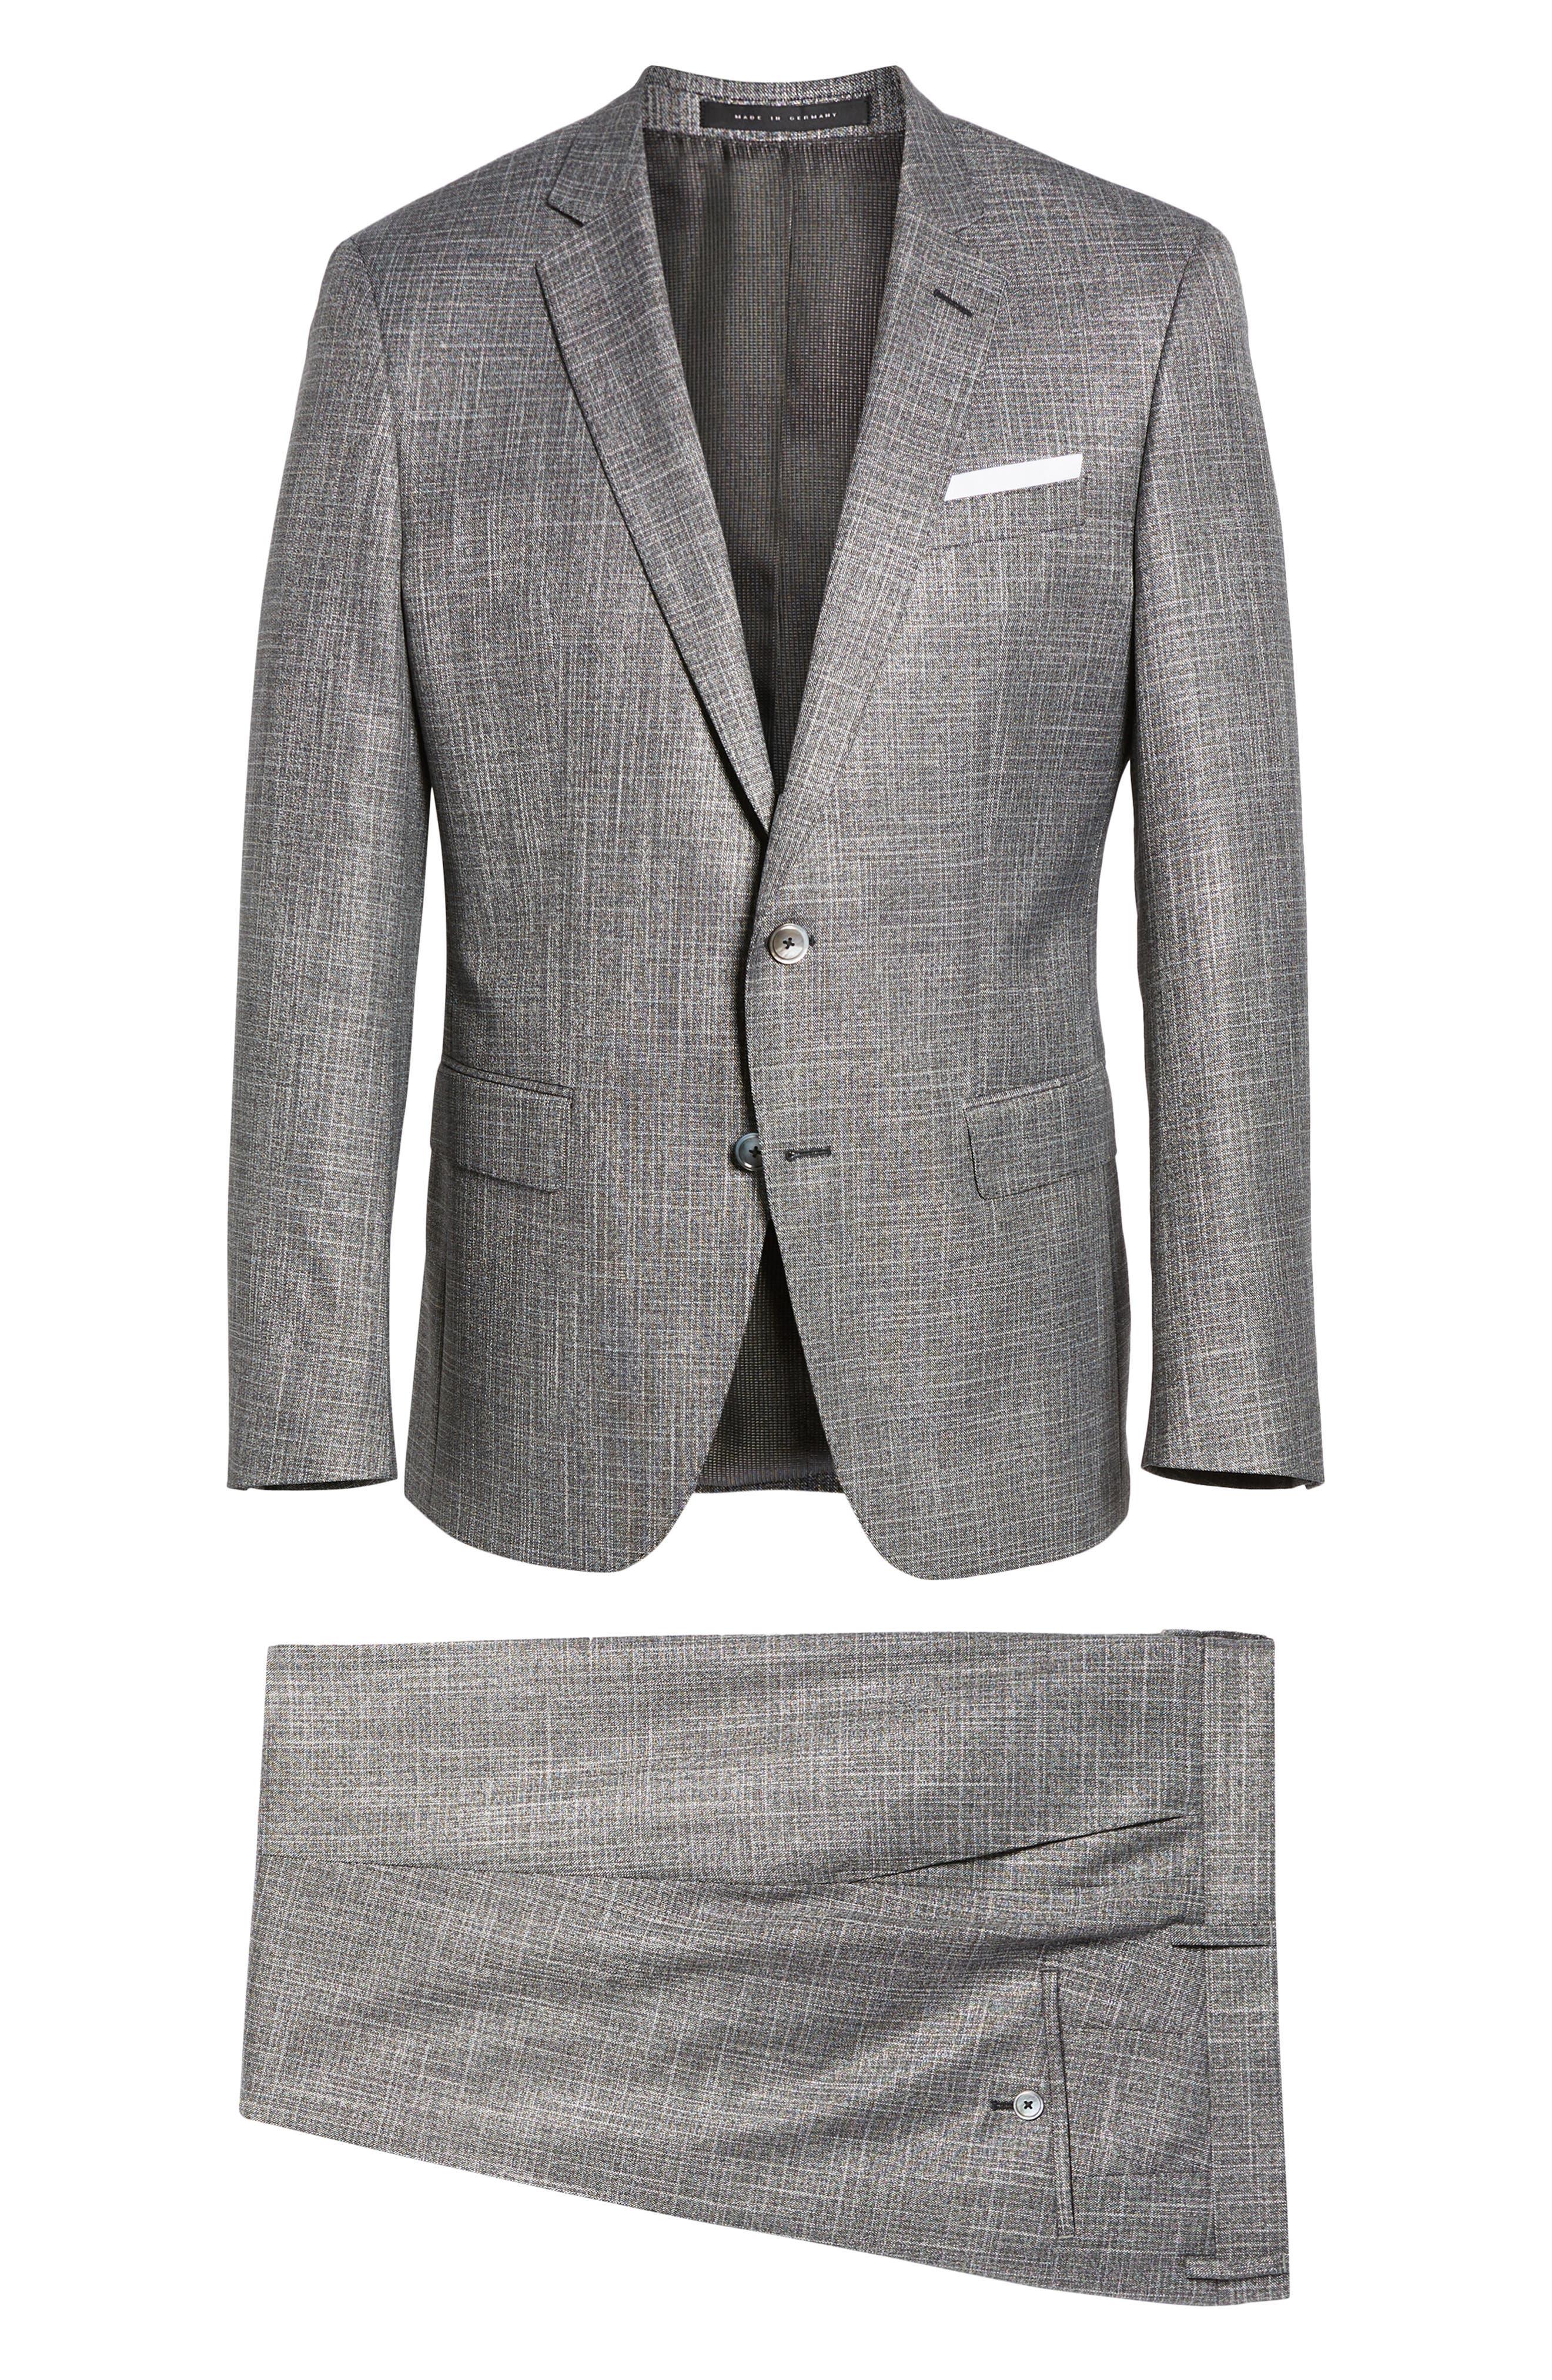 Hutson/Gander Trim Fit Solid Wool Blend Suit,                             Alternate thumbnail 8, color,                             MEDIUM GREY